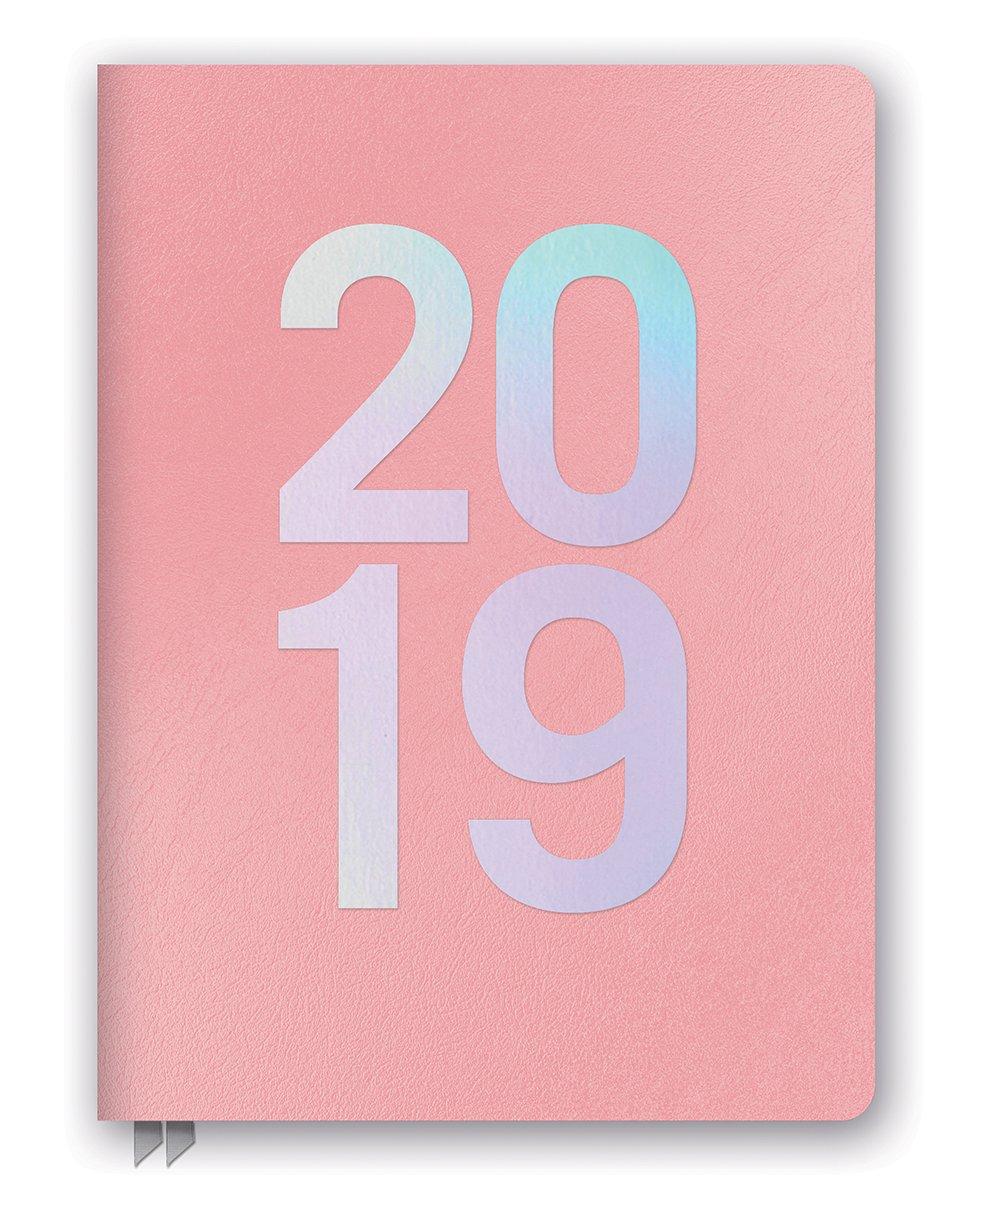 Orange Circle Studio 2019 Large Leatheresque Weekly Agenda, August 2018 - December 2019, Pink